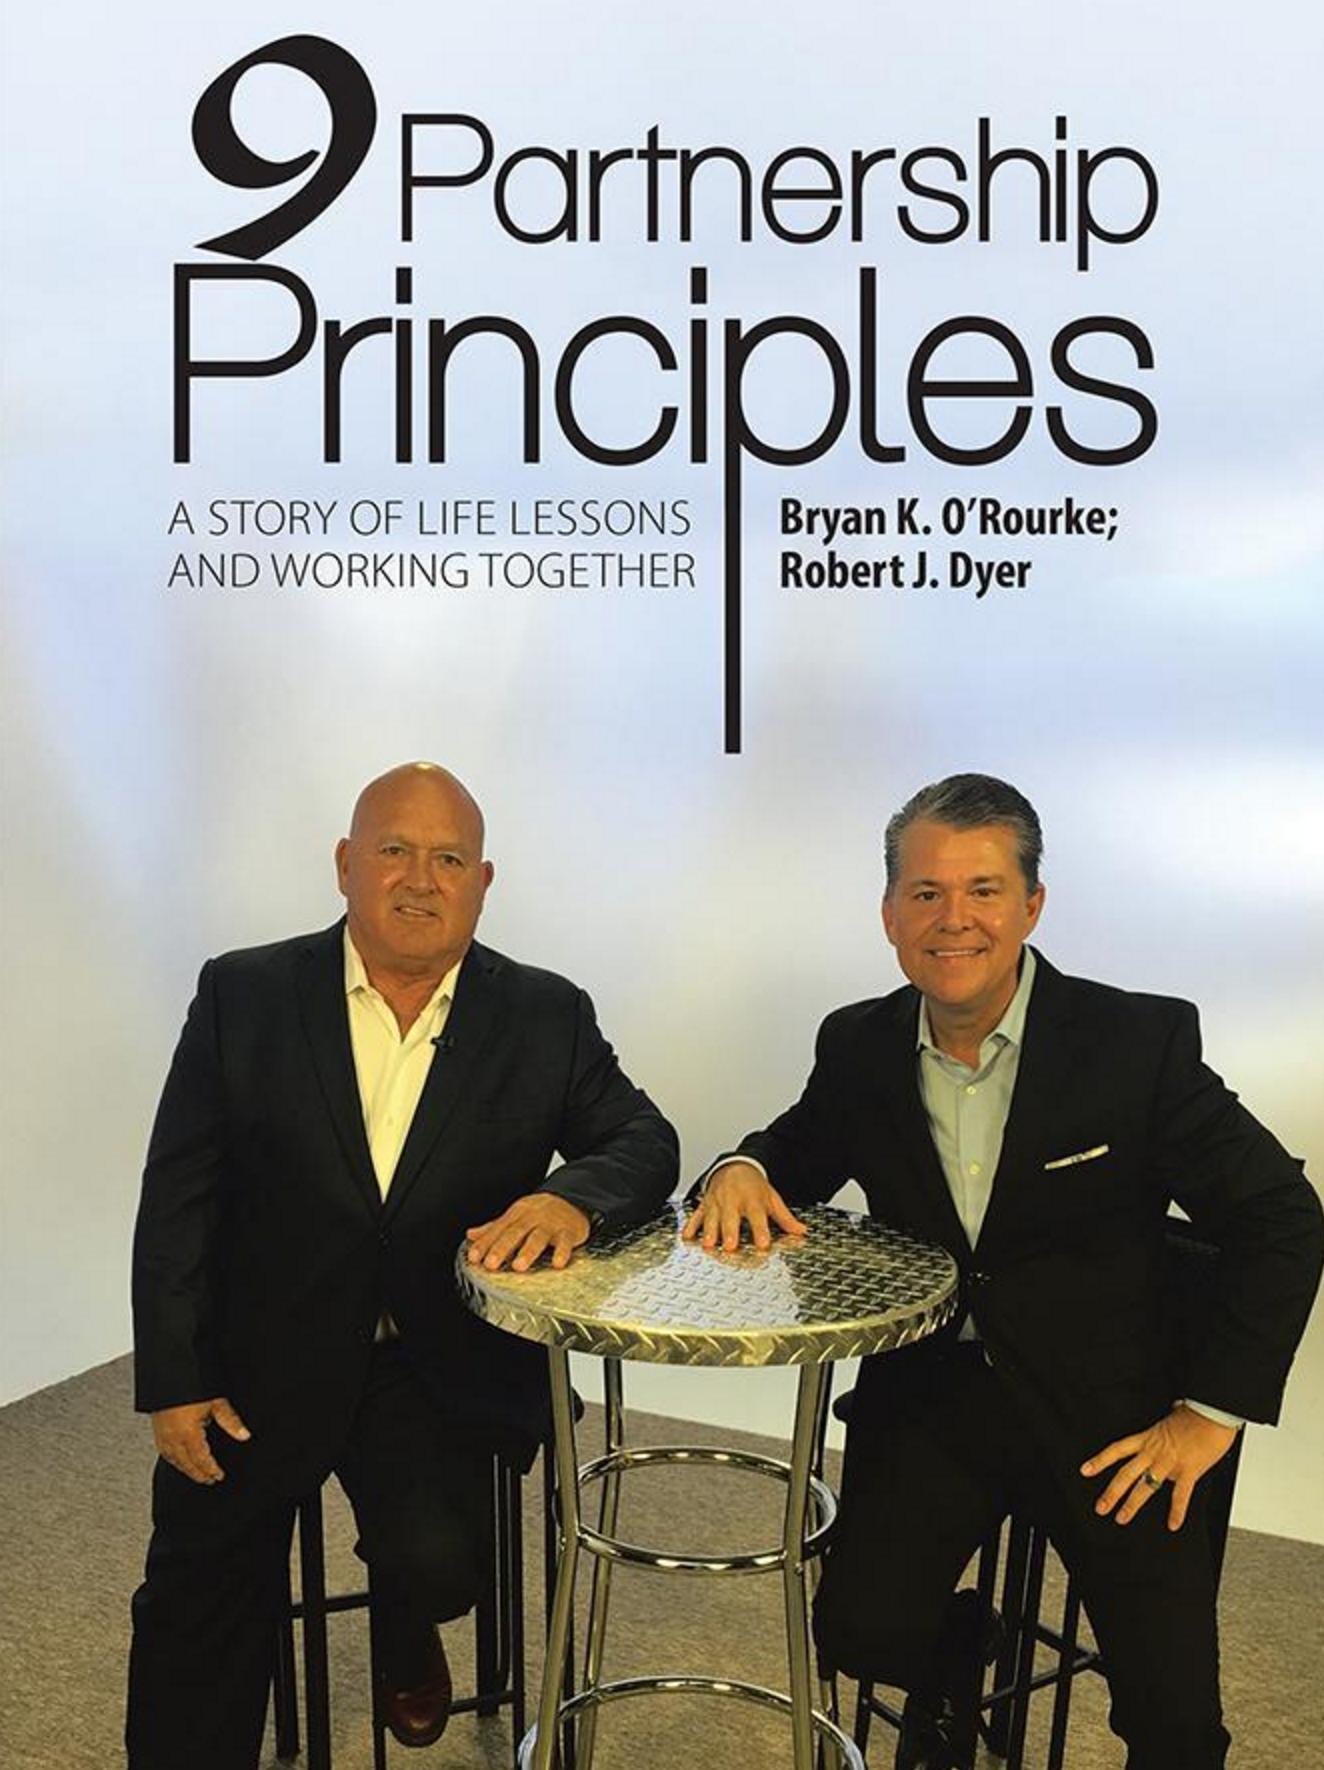 9+partnership+principles+robert+dyer+bryan+k+o'rourke+fitness+technology+podcast.png